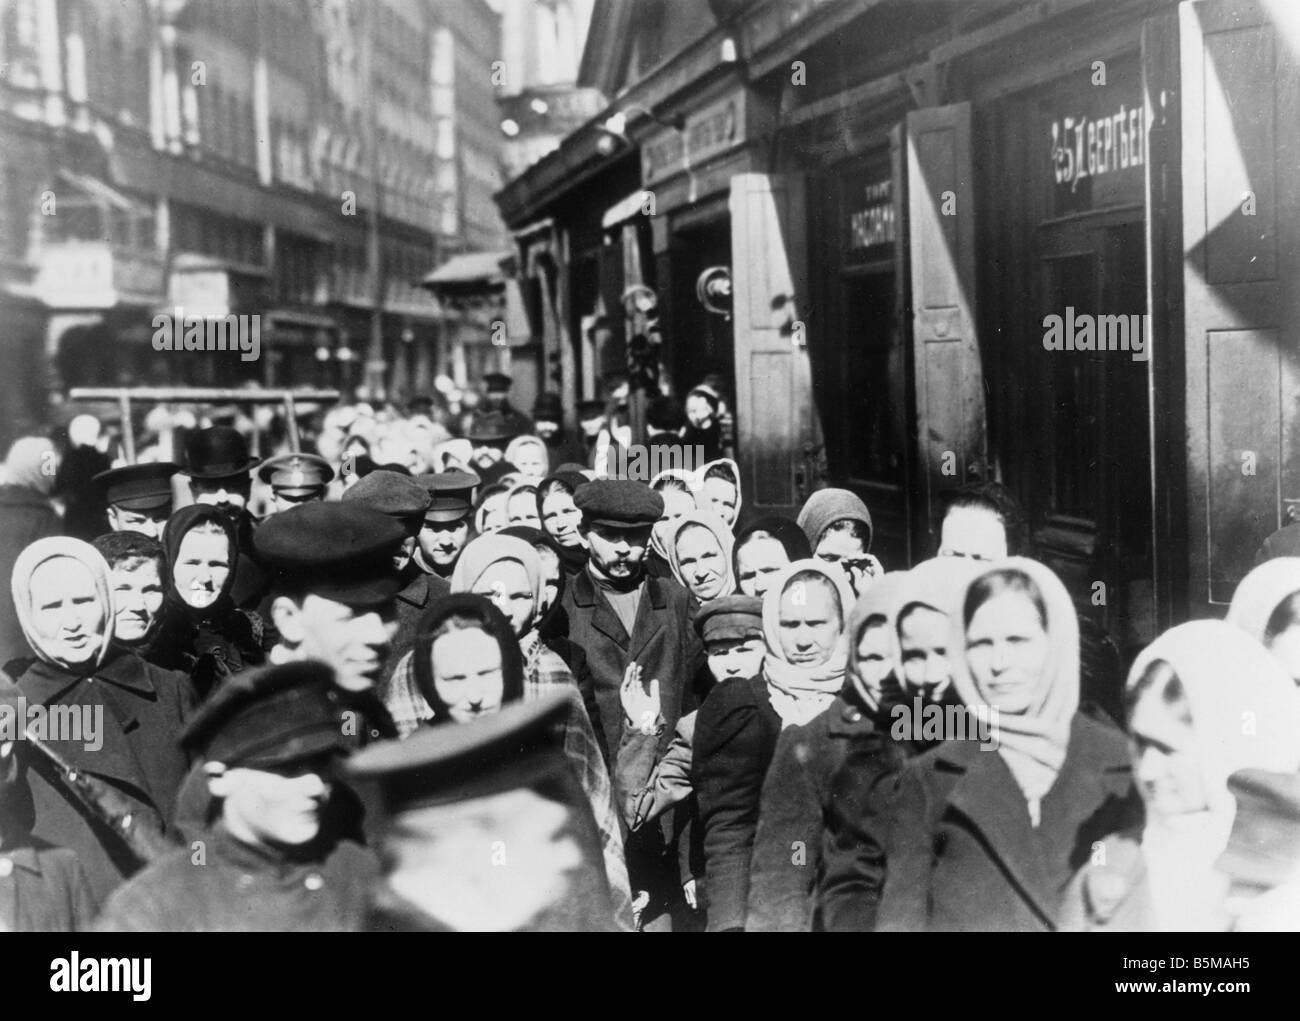 Food queues Russia World War I 1914 History World War I War economies Russia Queues outside a food shop Photo 1914 - Stock Image